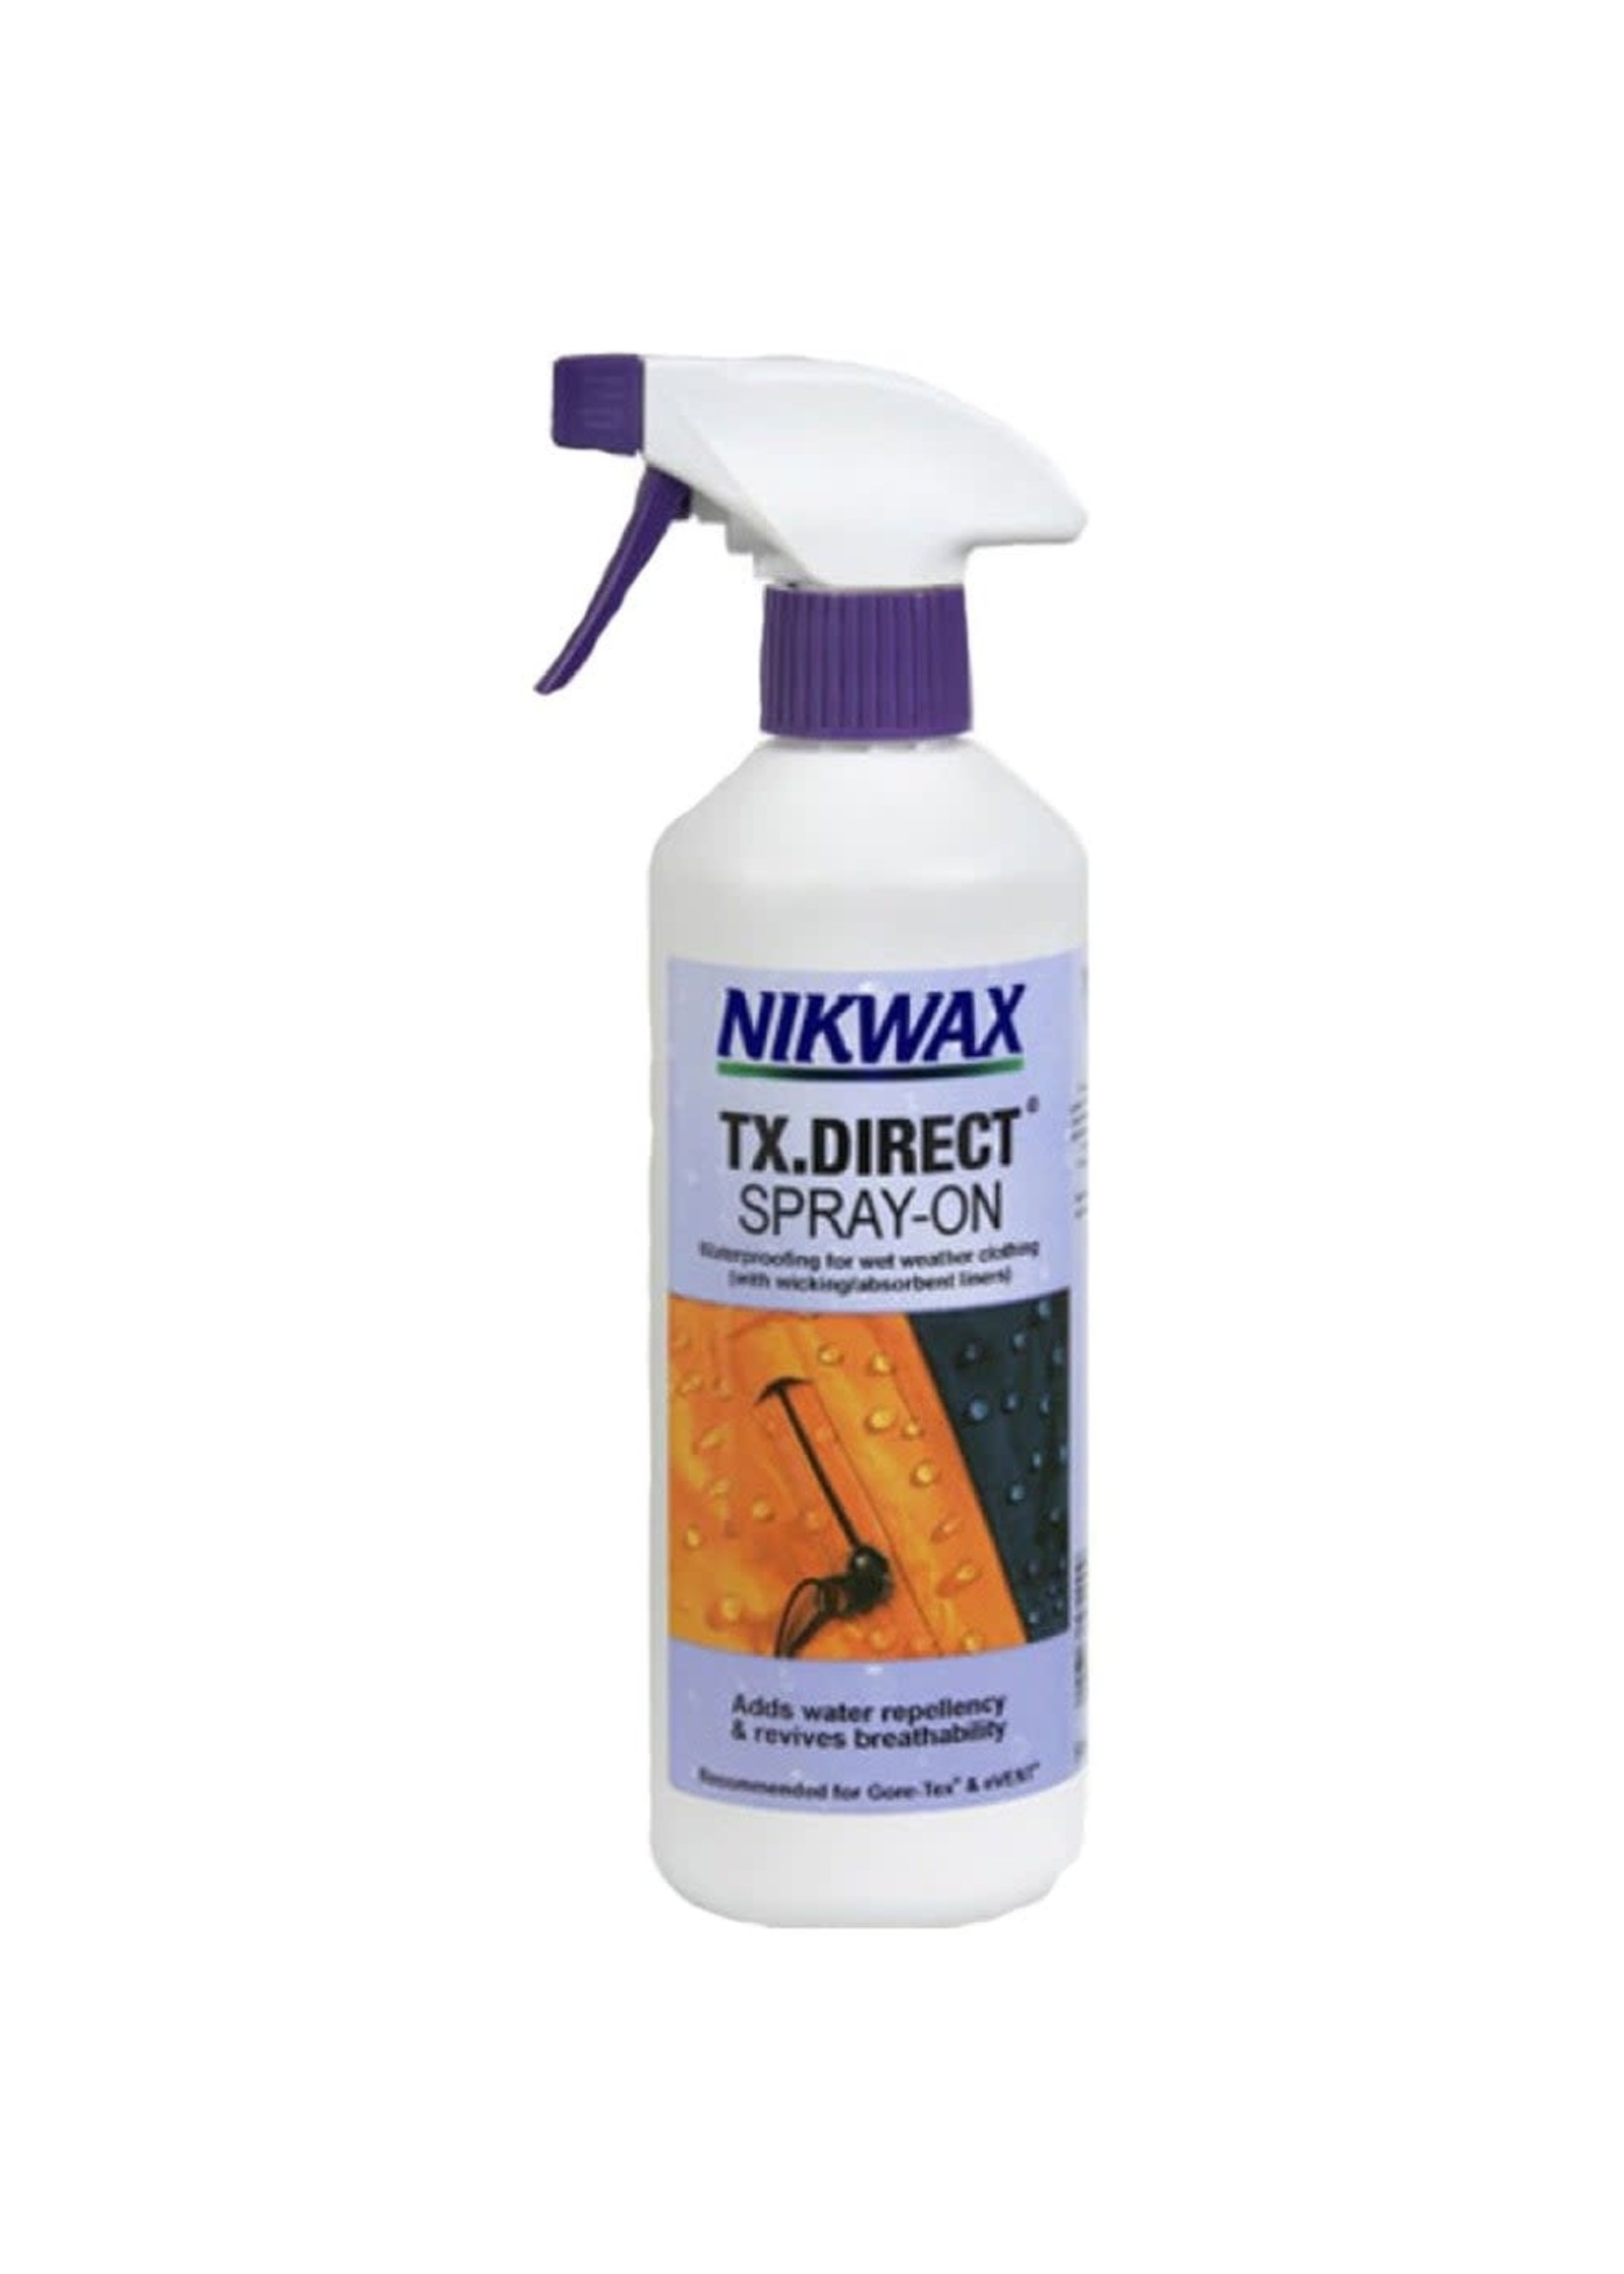 Nikwax Nikwax TX.Direct Spray-On Waterproofing 300ml